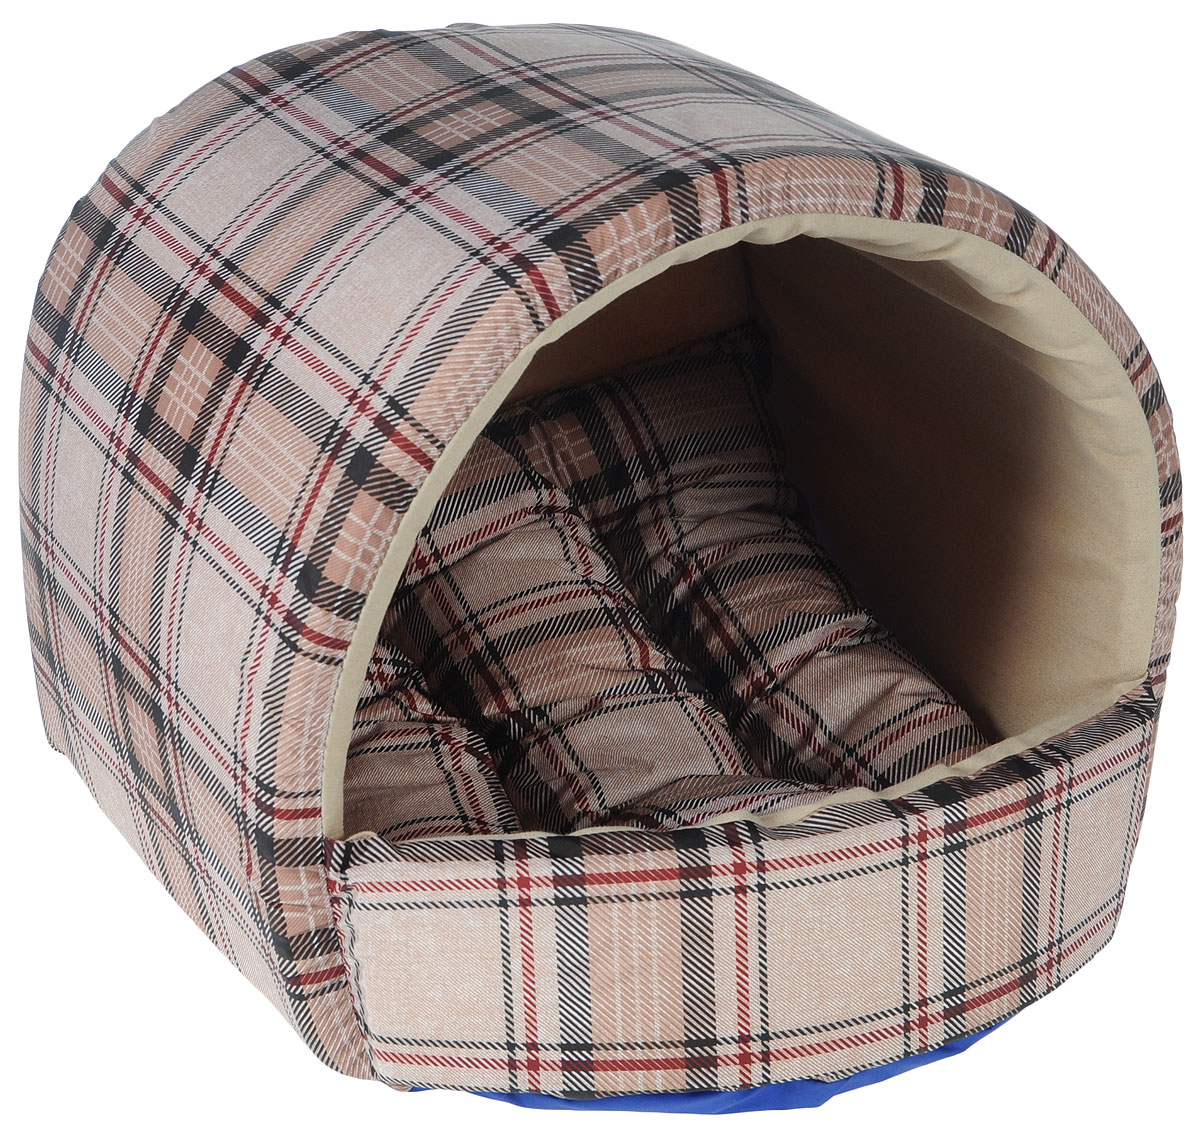 Домик для собак Happy Puppy Классик, 37 x 37 x 40 см домик для собак happy puppy классик 37 x 37 x 40 см